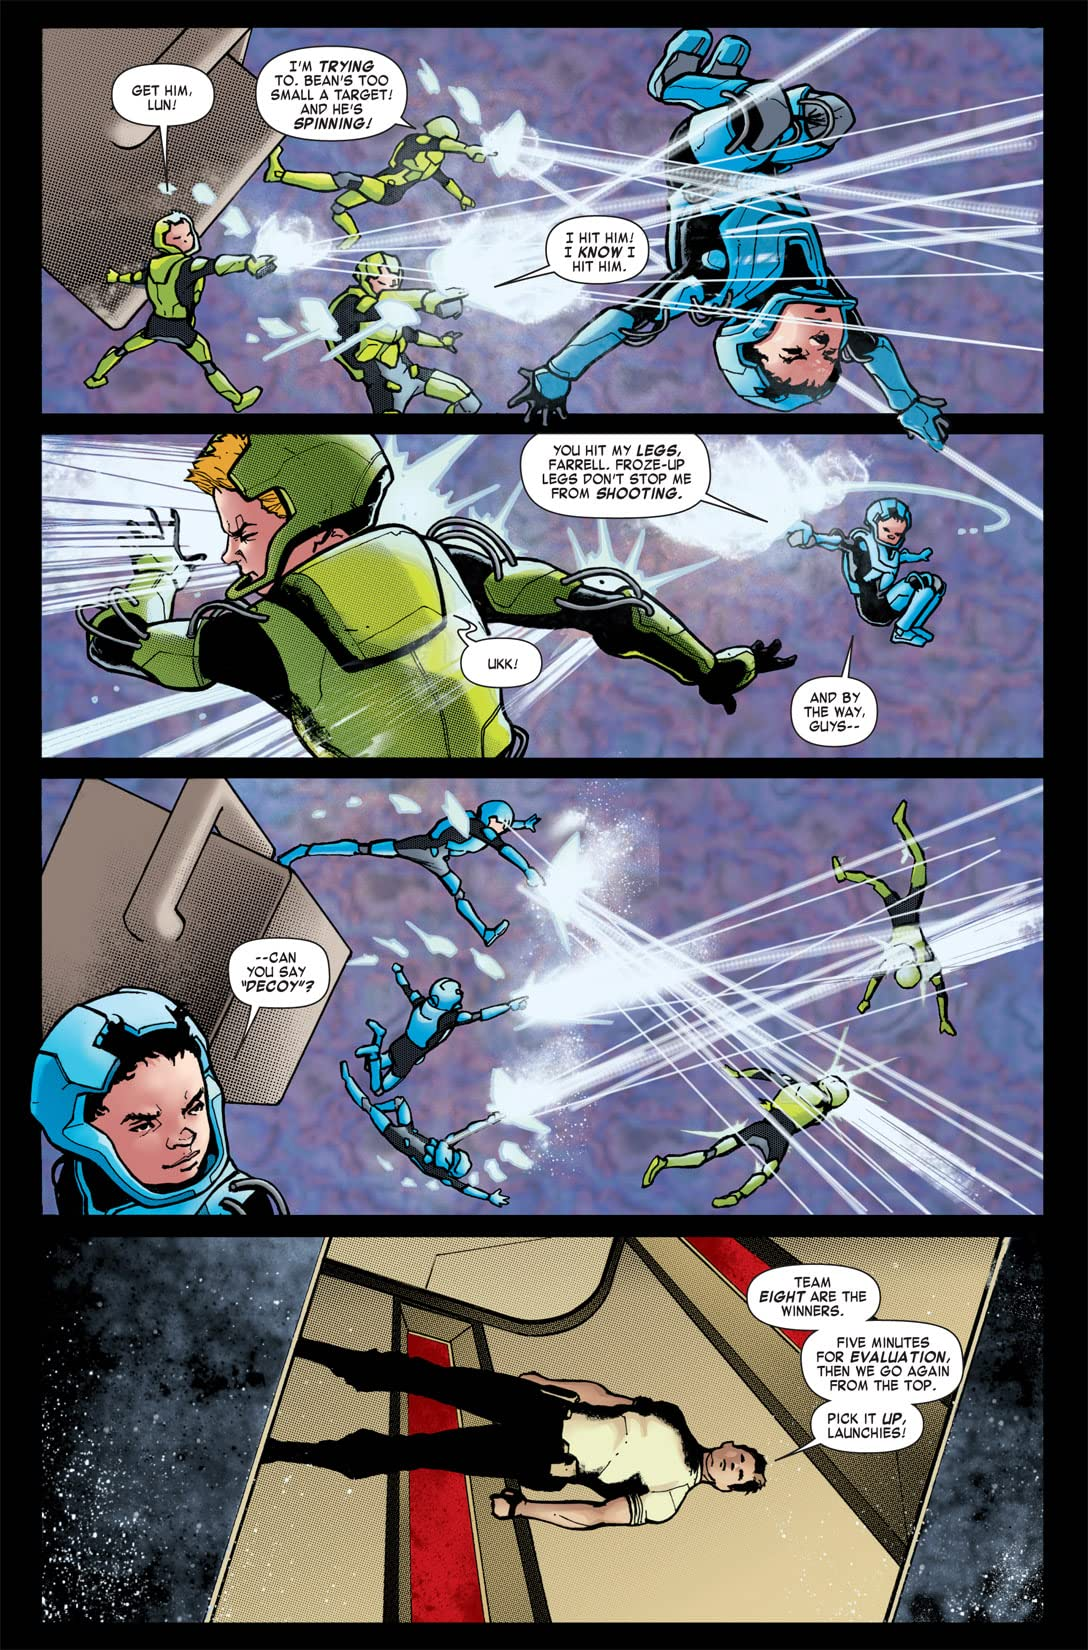 Ender's Shadow Book One: Battle School #5 (of 5)